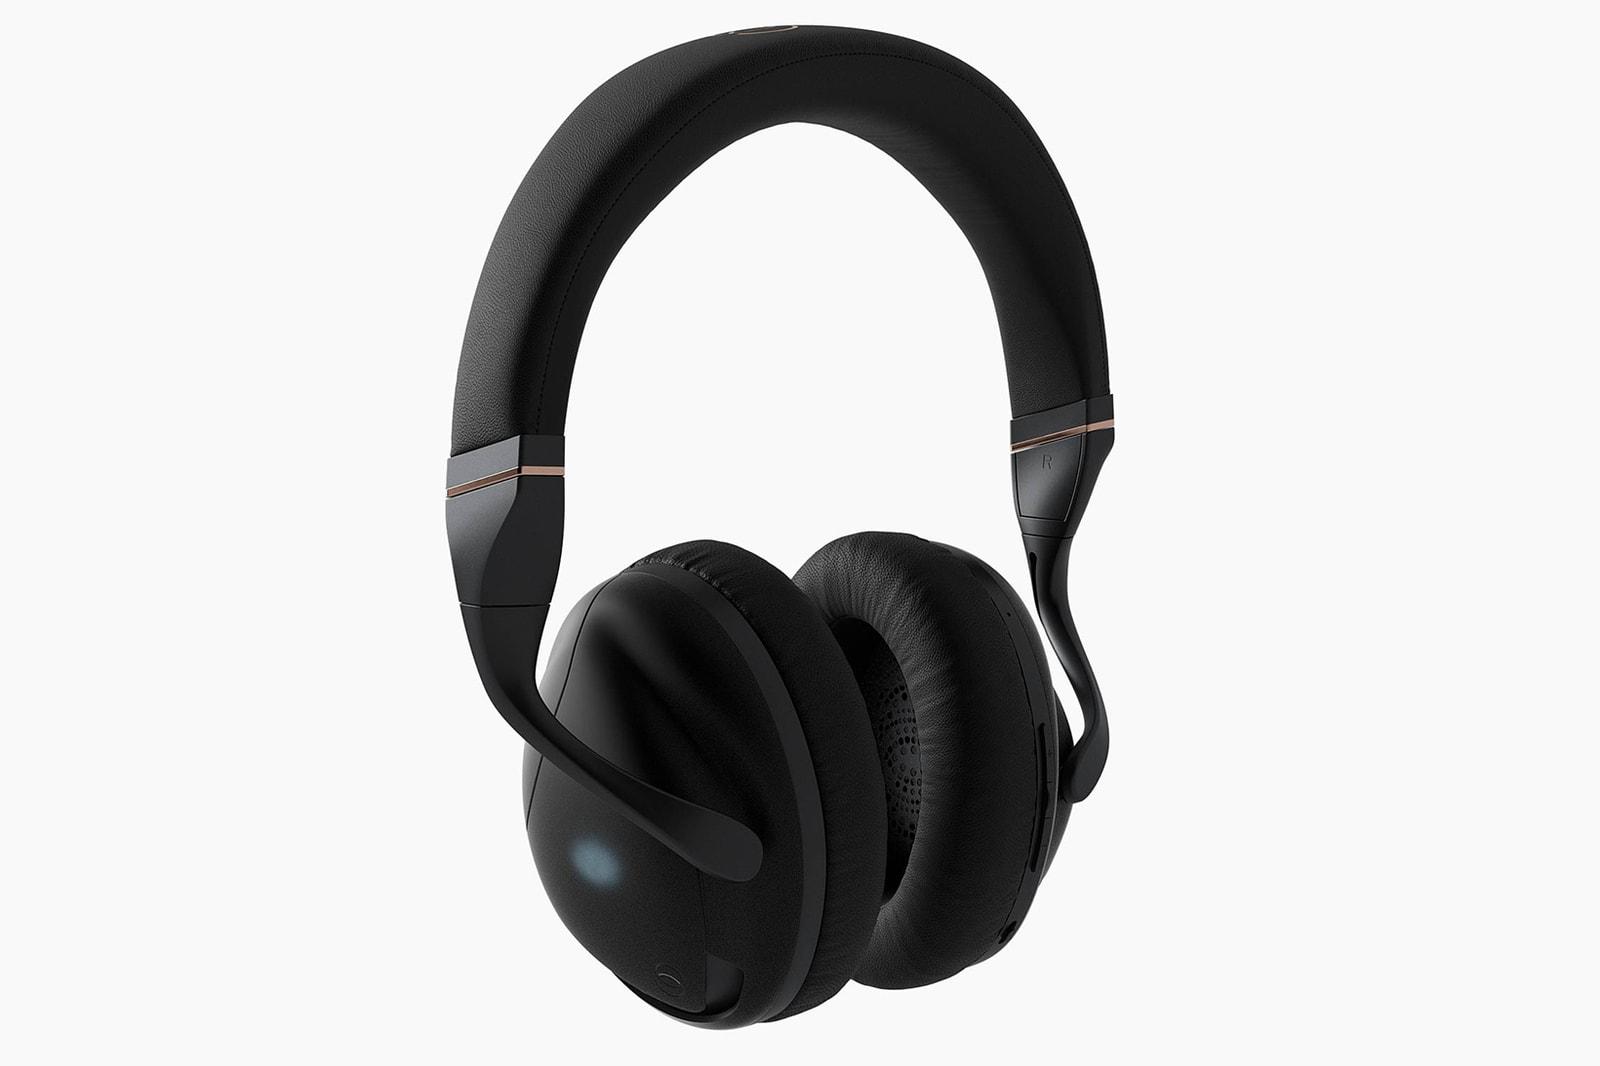 IRIS Flow Headphones Ultimate Listening Experience Flow State Conchord